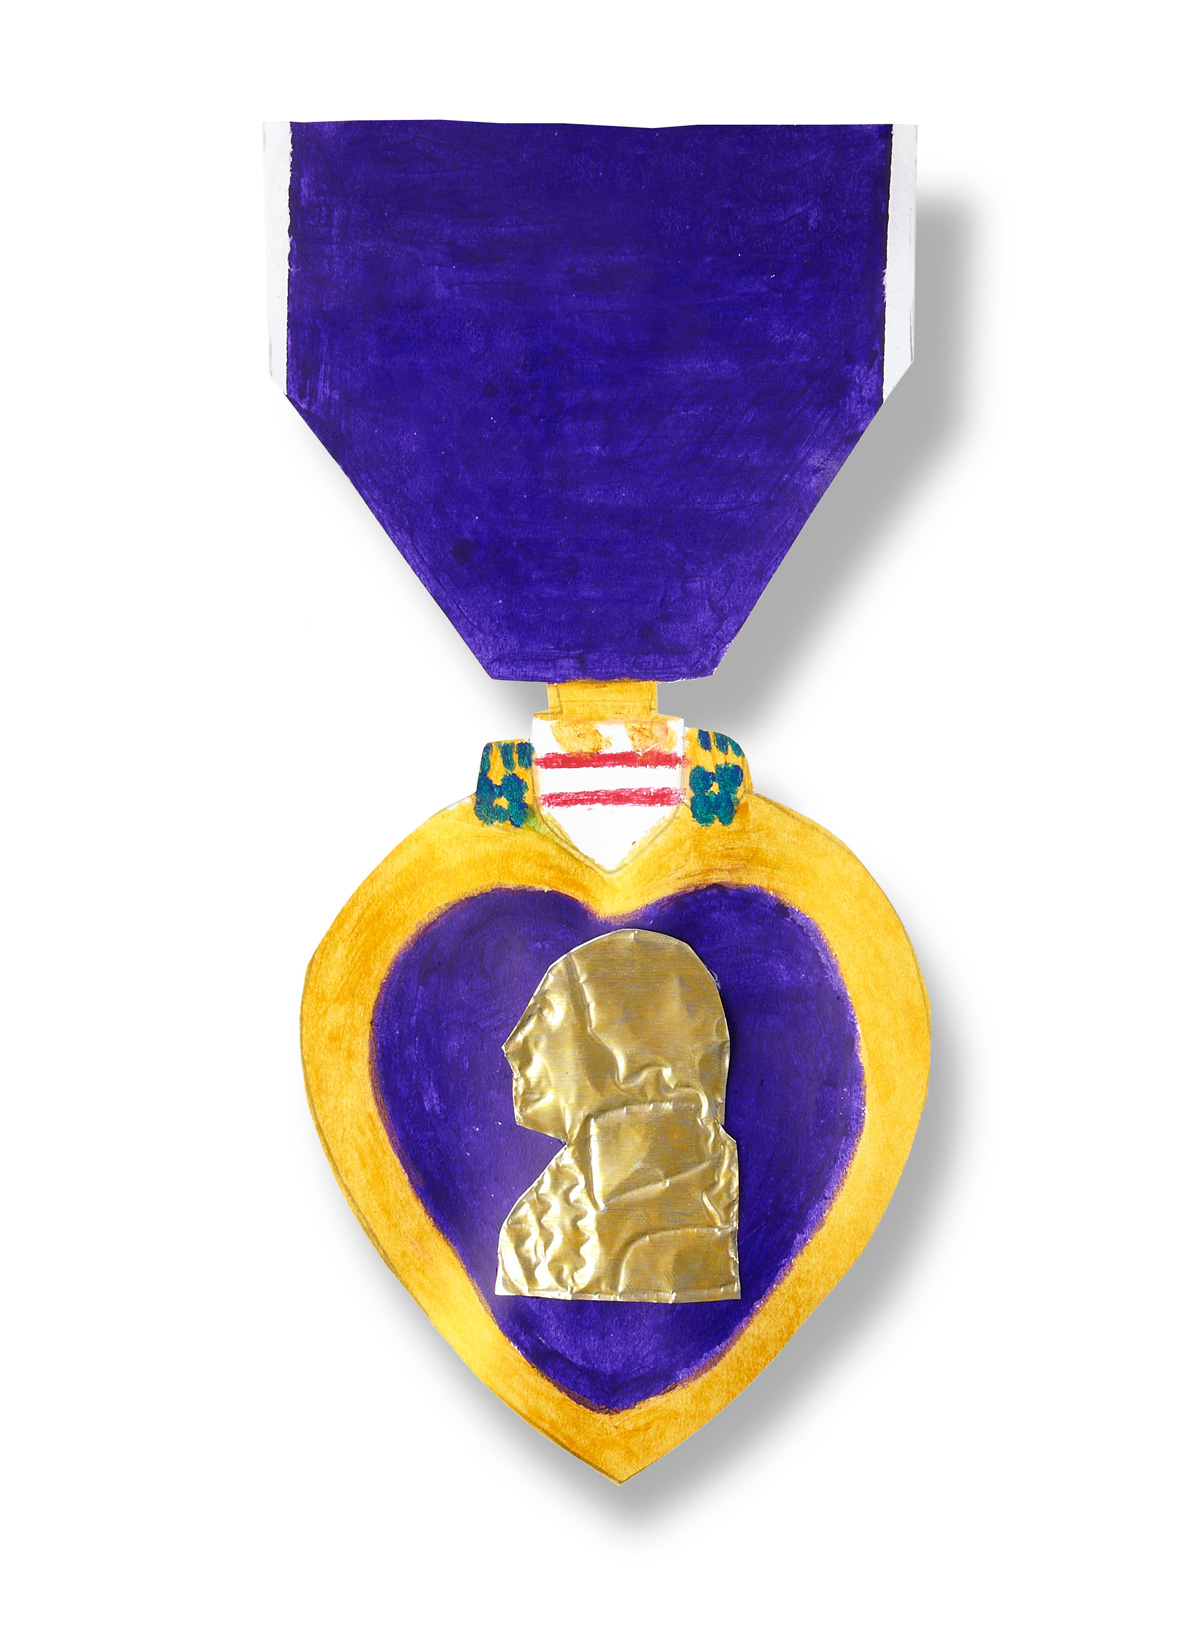 Go back gt gallery for gt purple heart medal outline